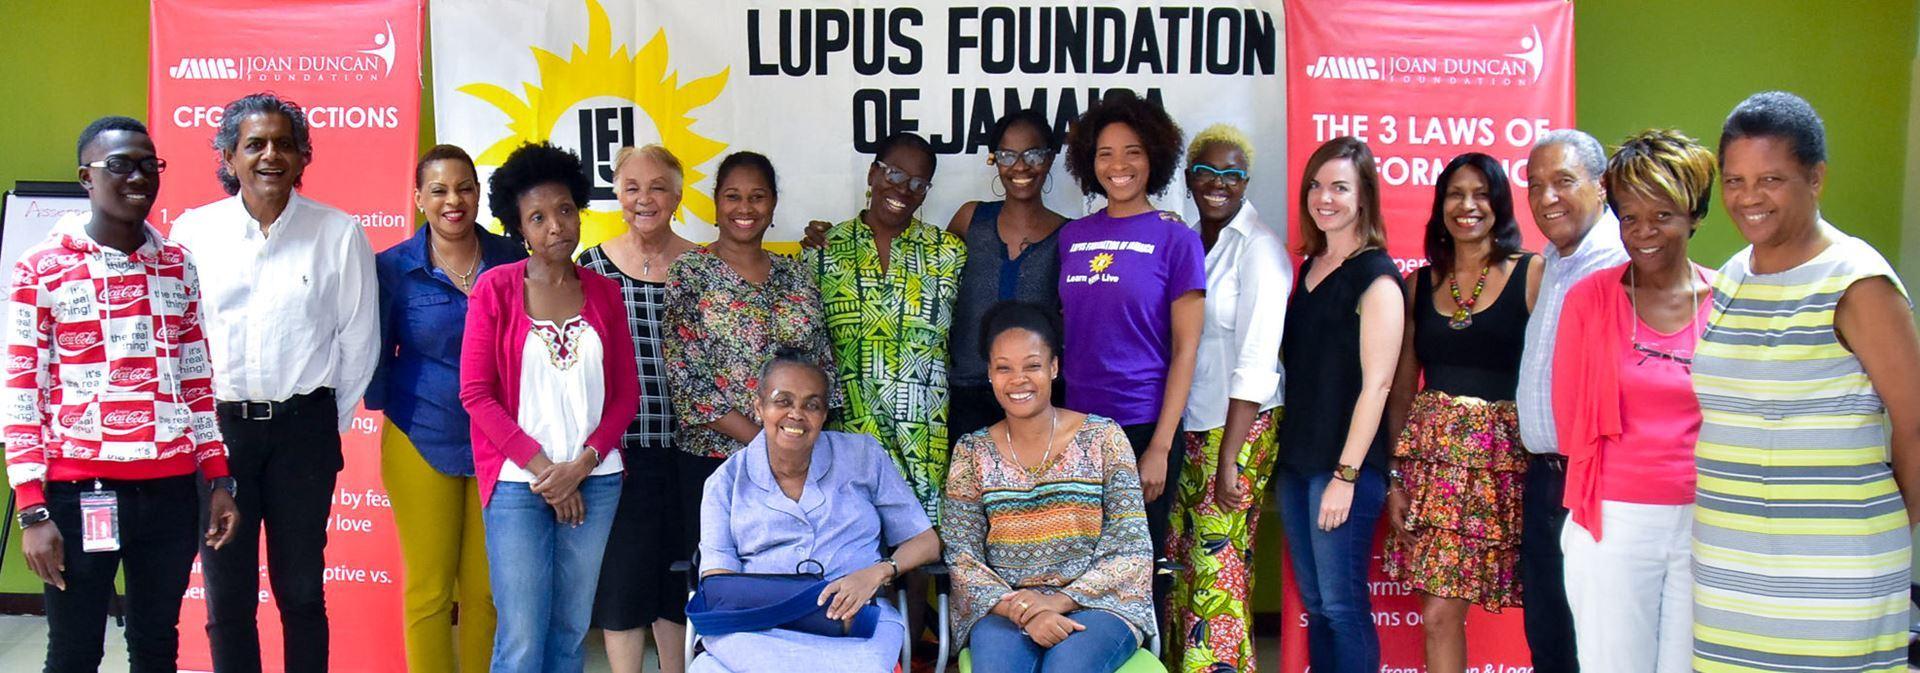 Lupus Foundation of Jamaica - Home